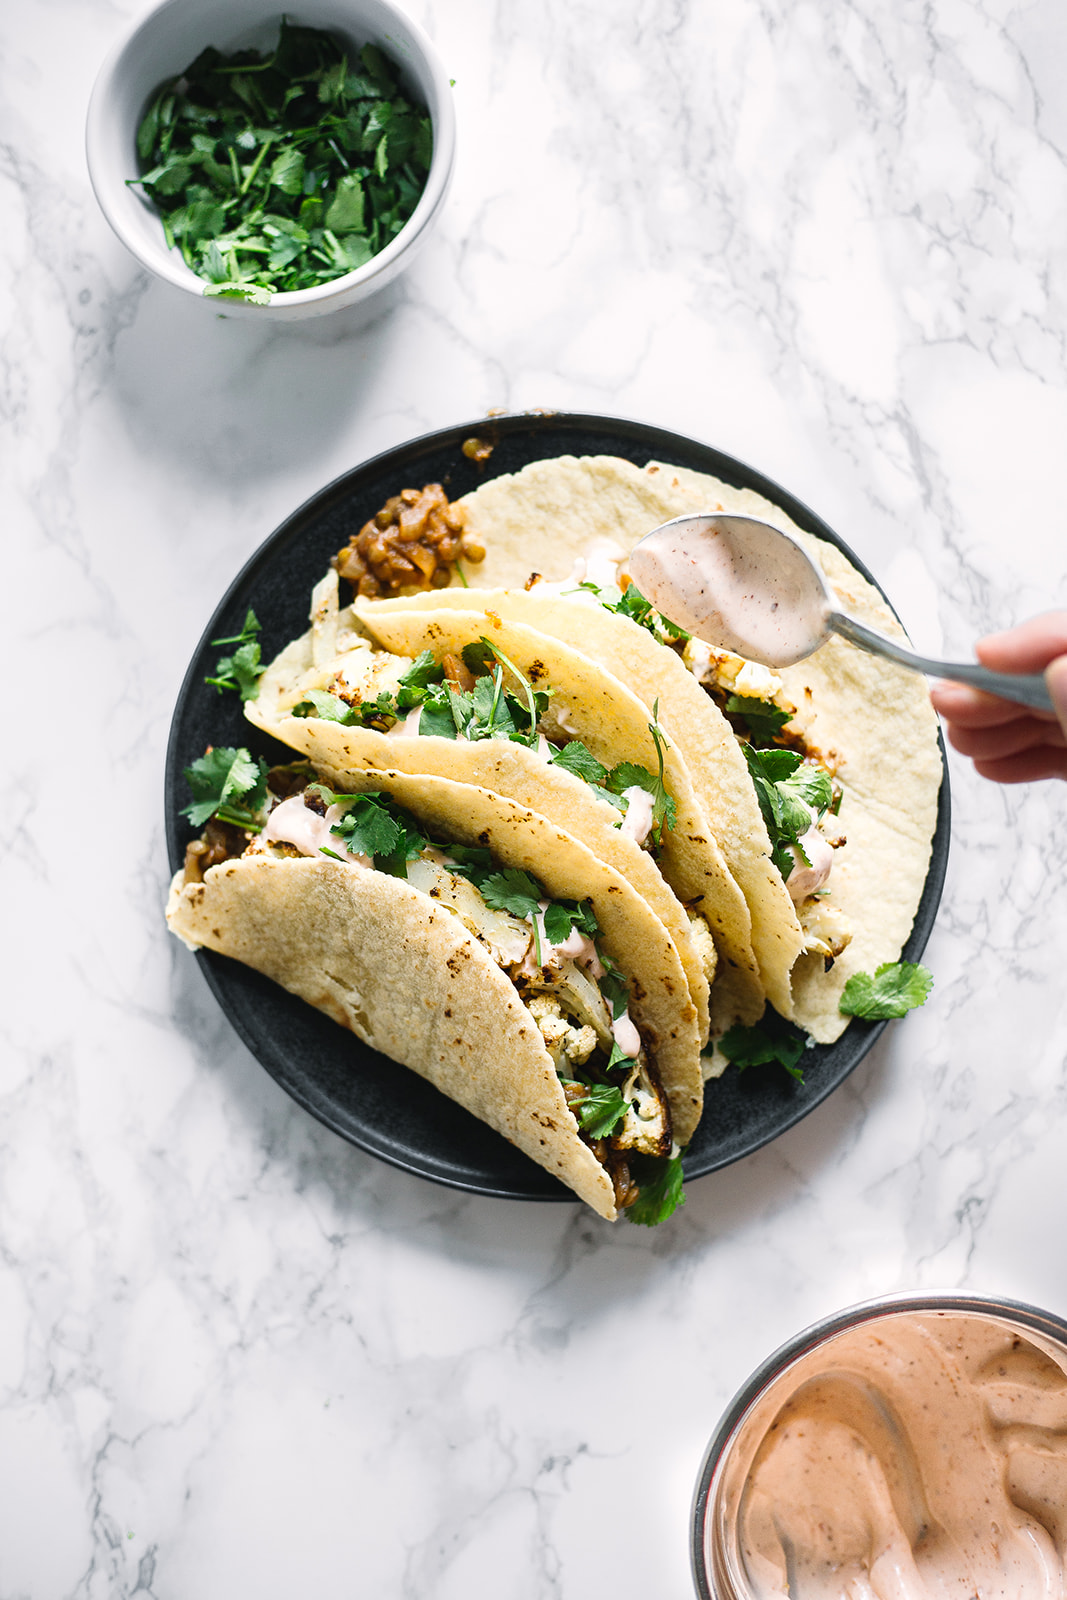 Cauliflower and Lentil Tacos